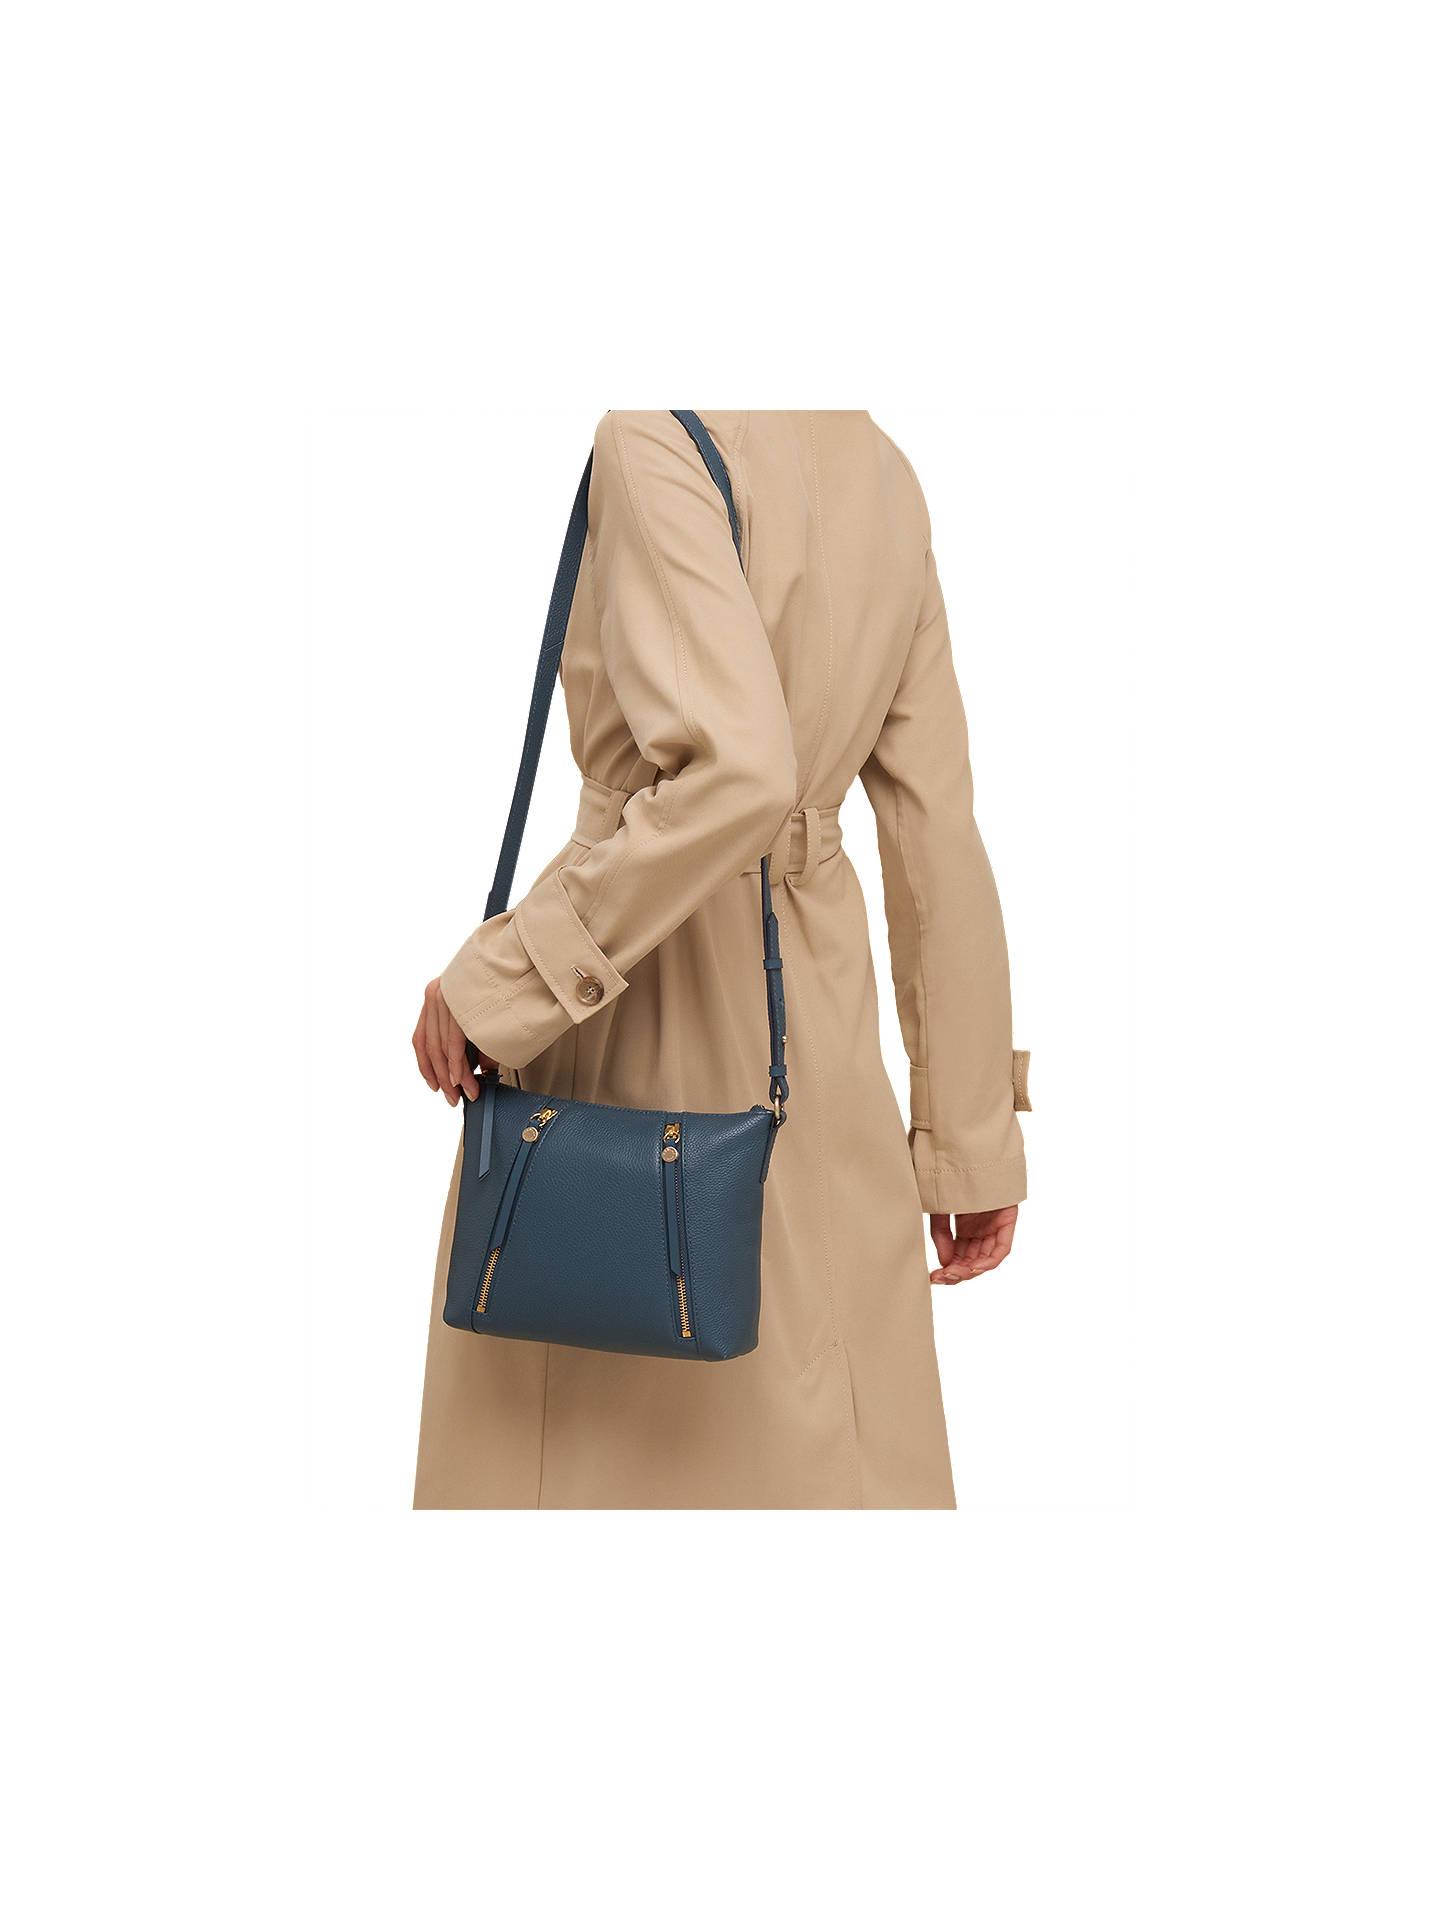 d79b29c736 Radley Fountain Road Small Leather Zip Top Cross Body Bag at John ...